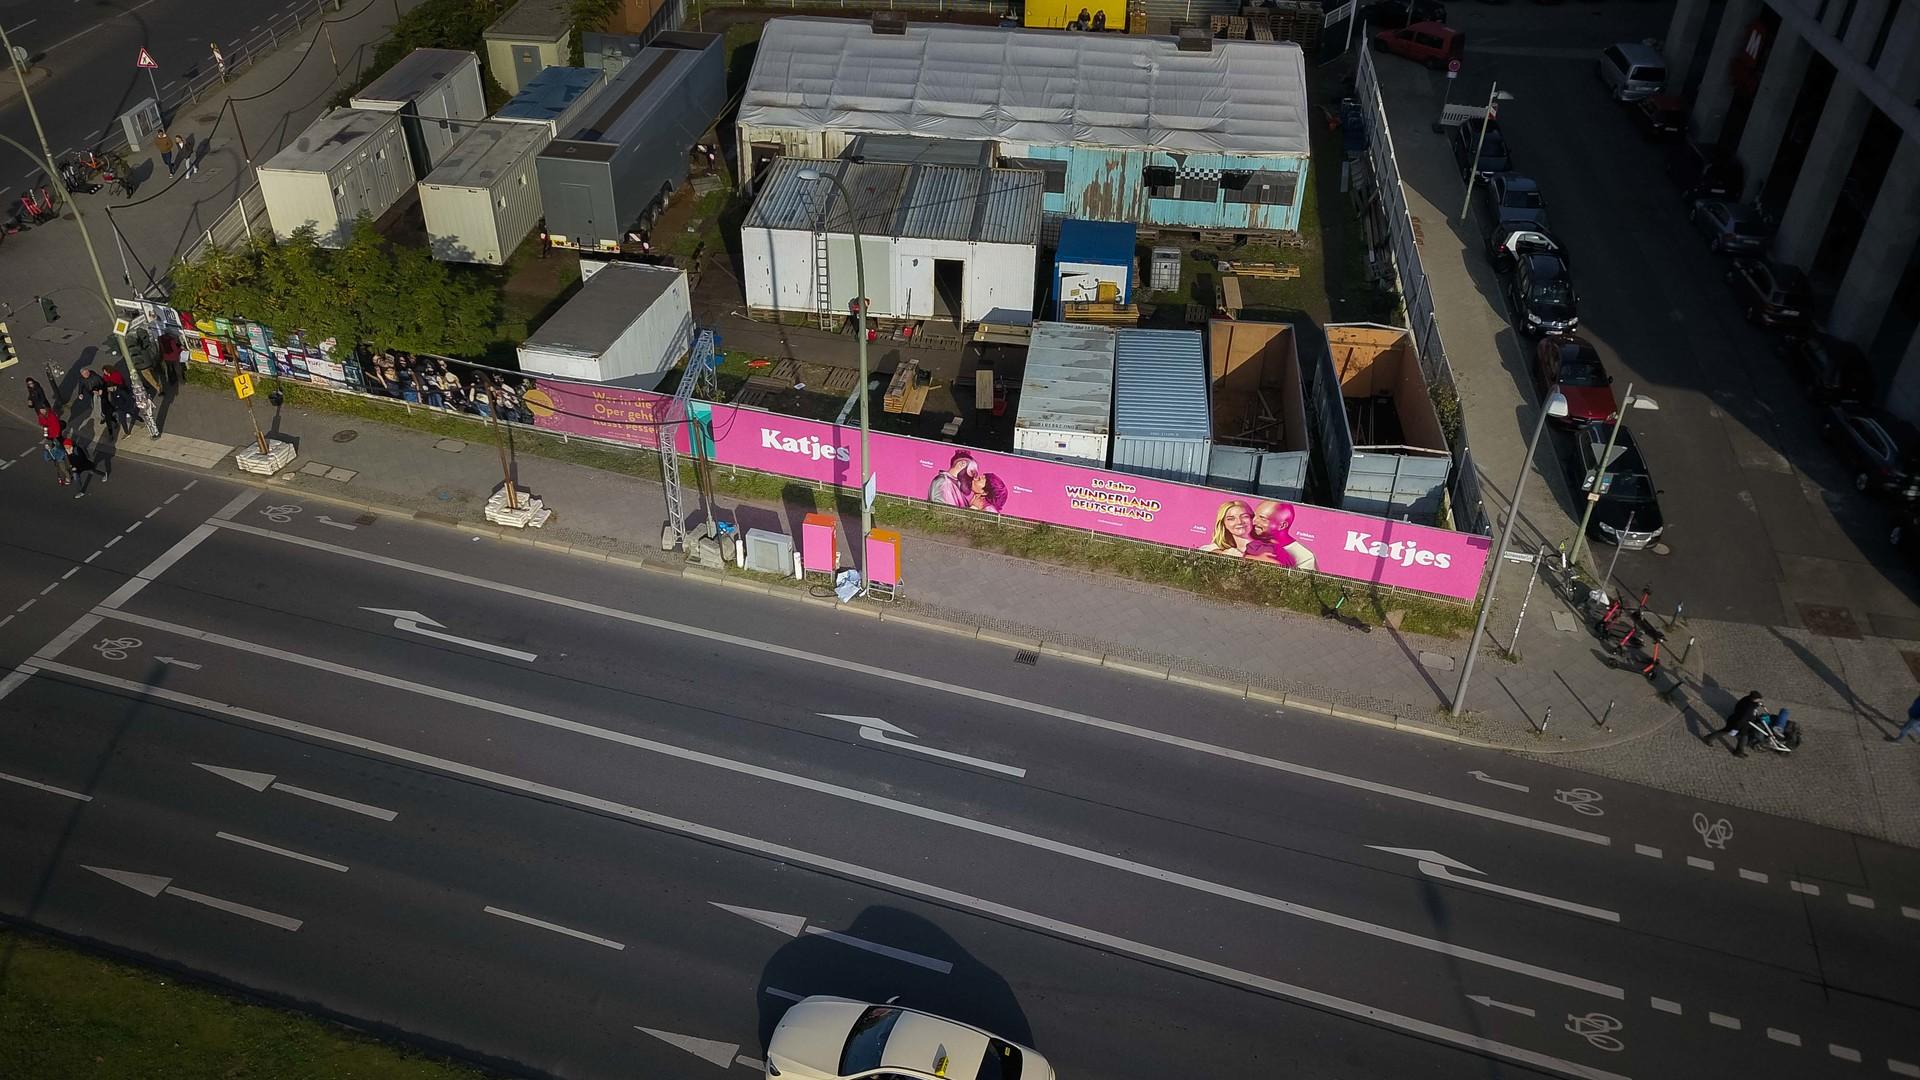 Sweet Celebrations: Creating a Graffiti Advert for Katjes